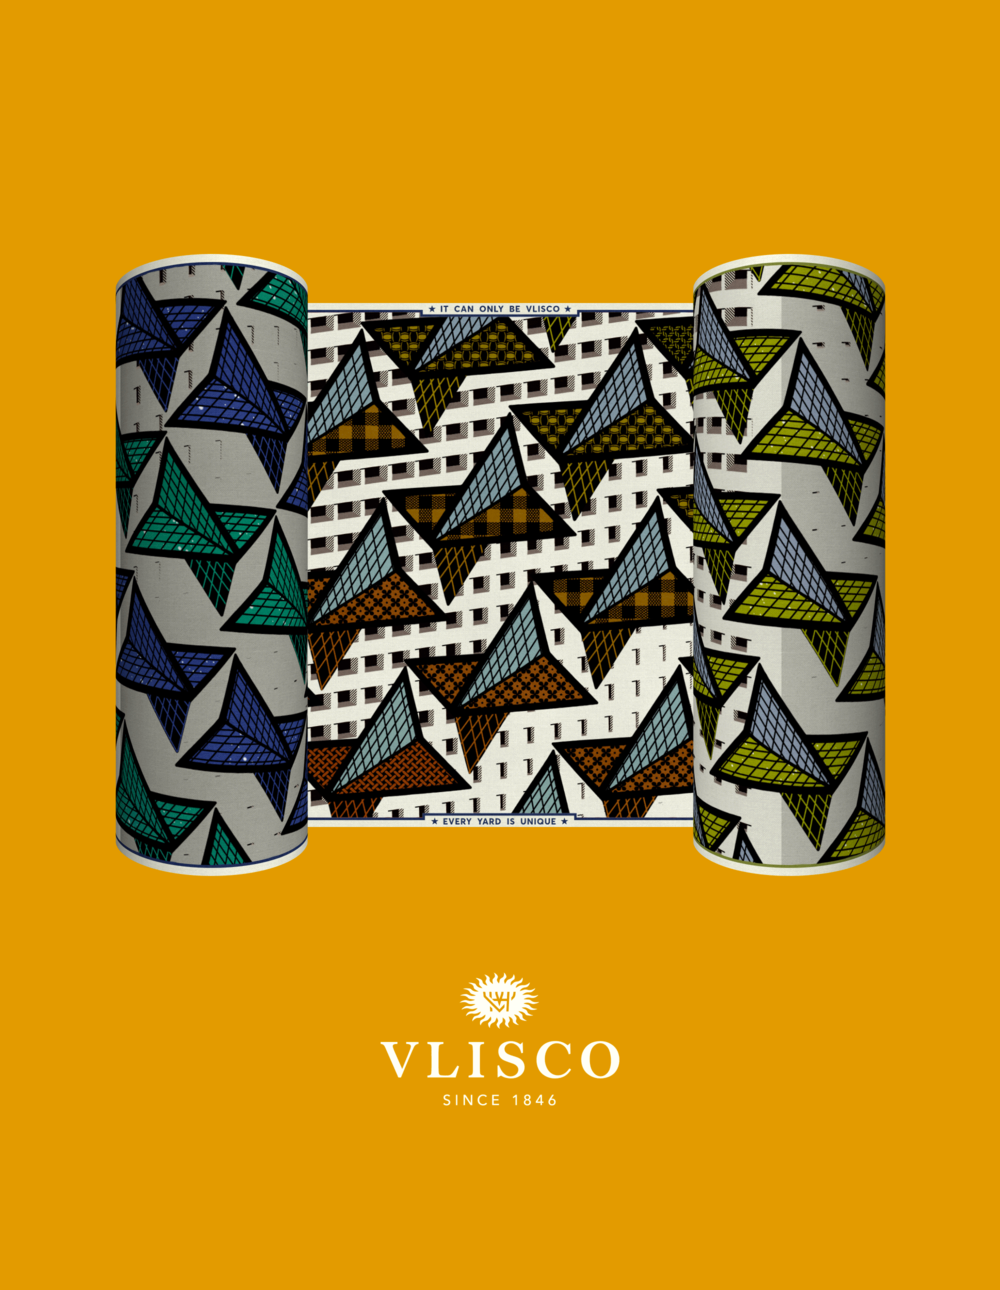 VLISCO_PRINT_00010.png